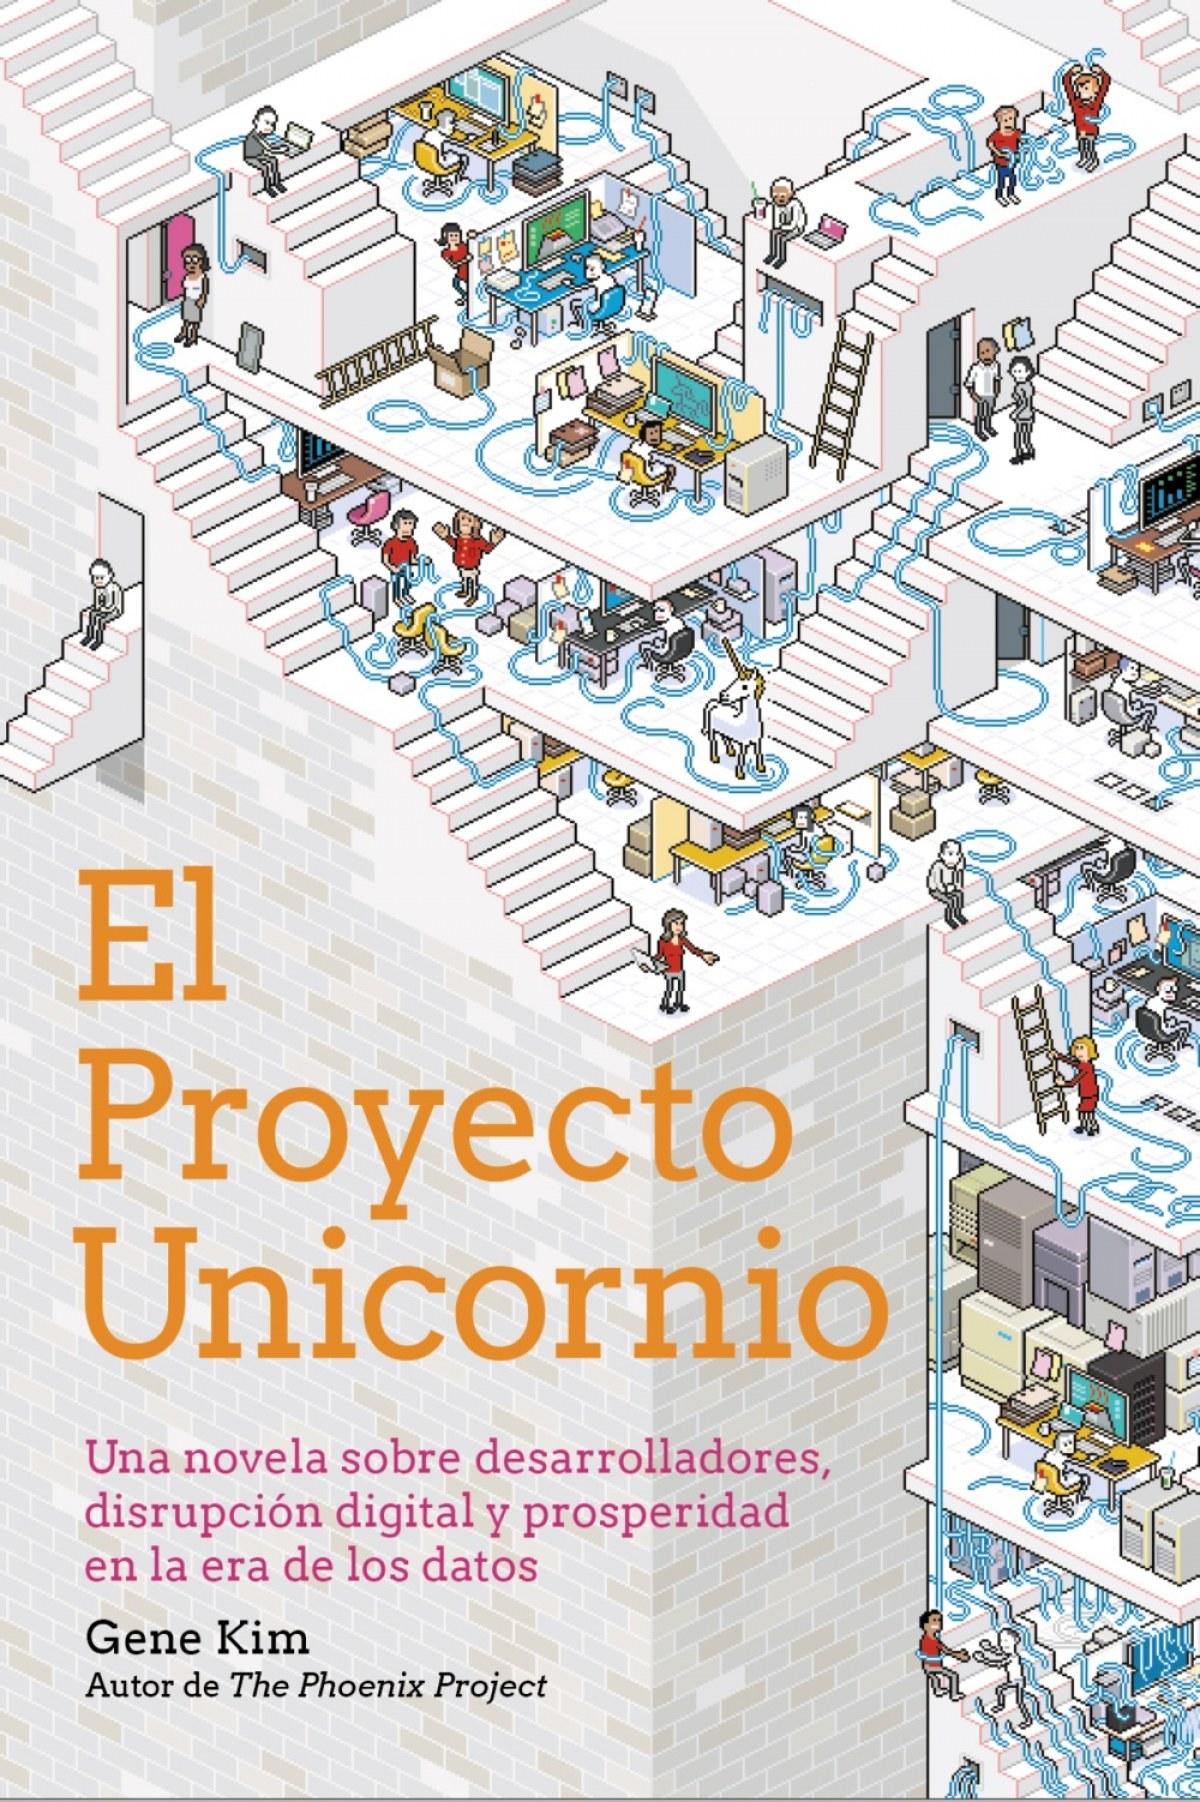 El Proyecto Unicornio